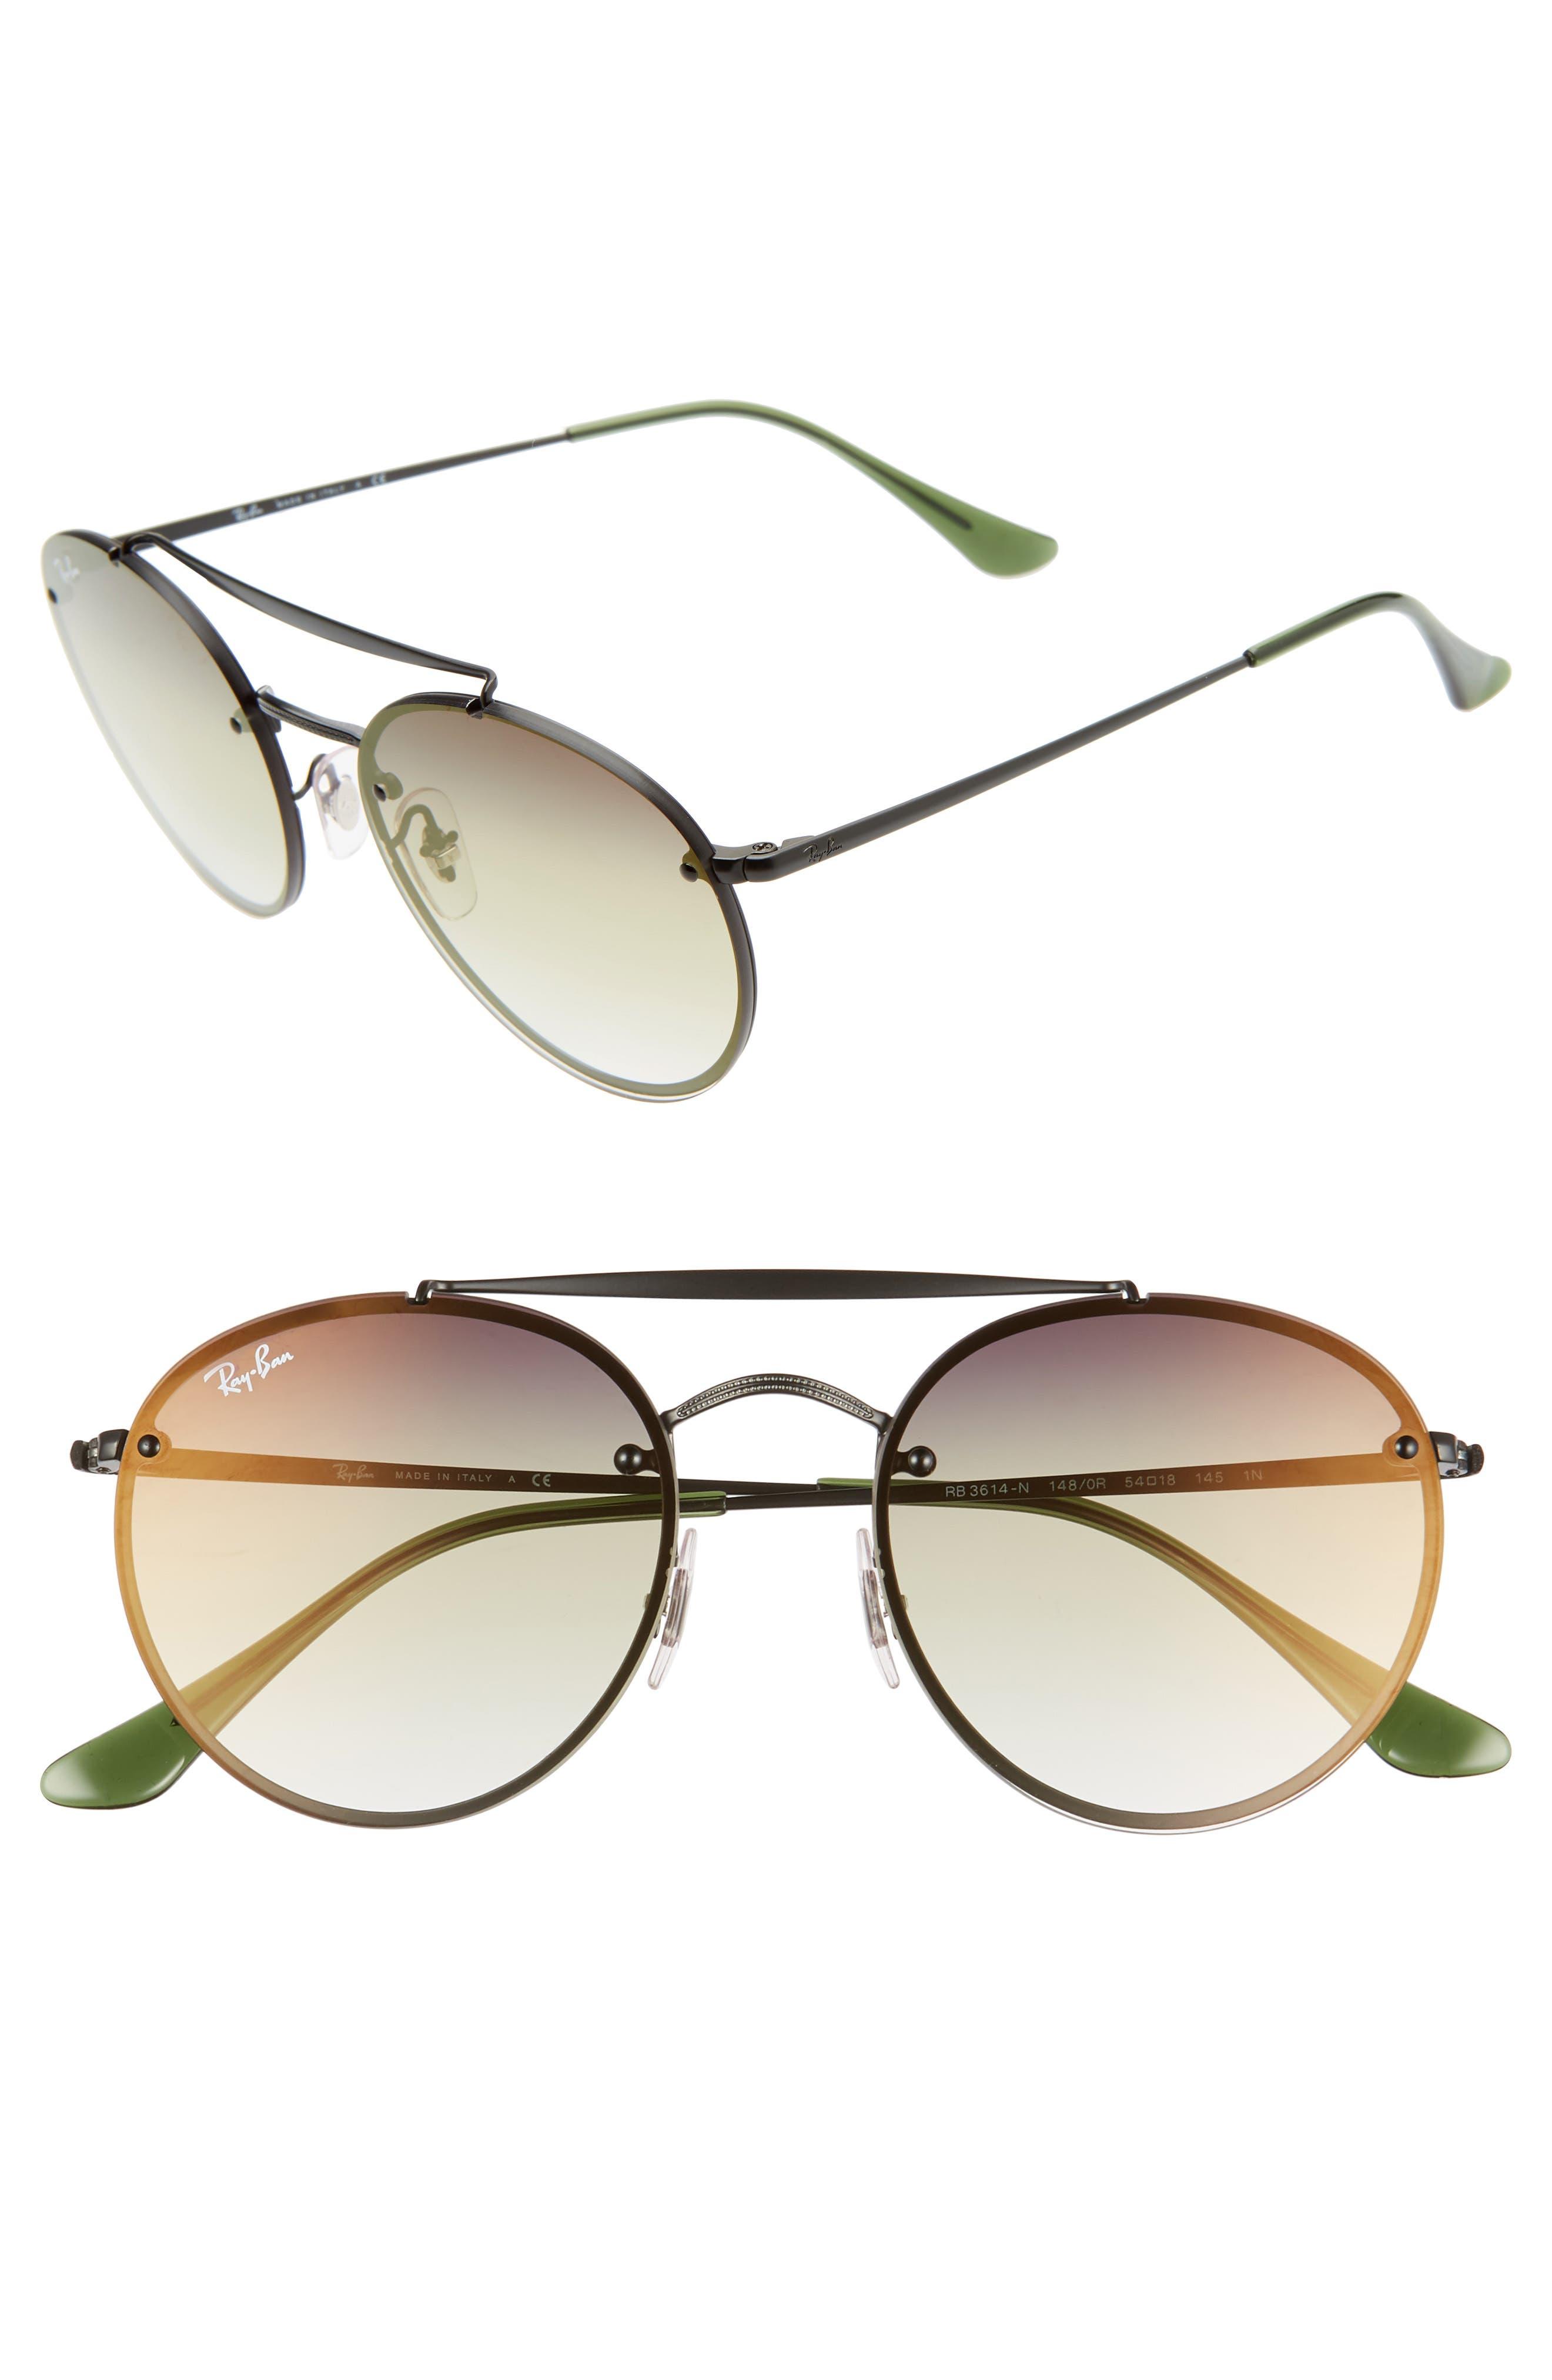 Ray-Ban 5m Polarized Gradient Round Sunglasses -